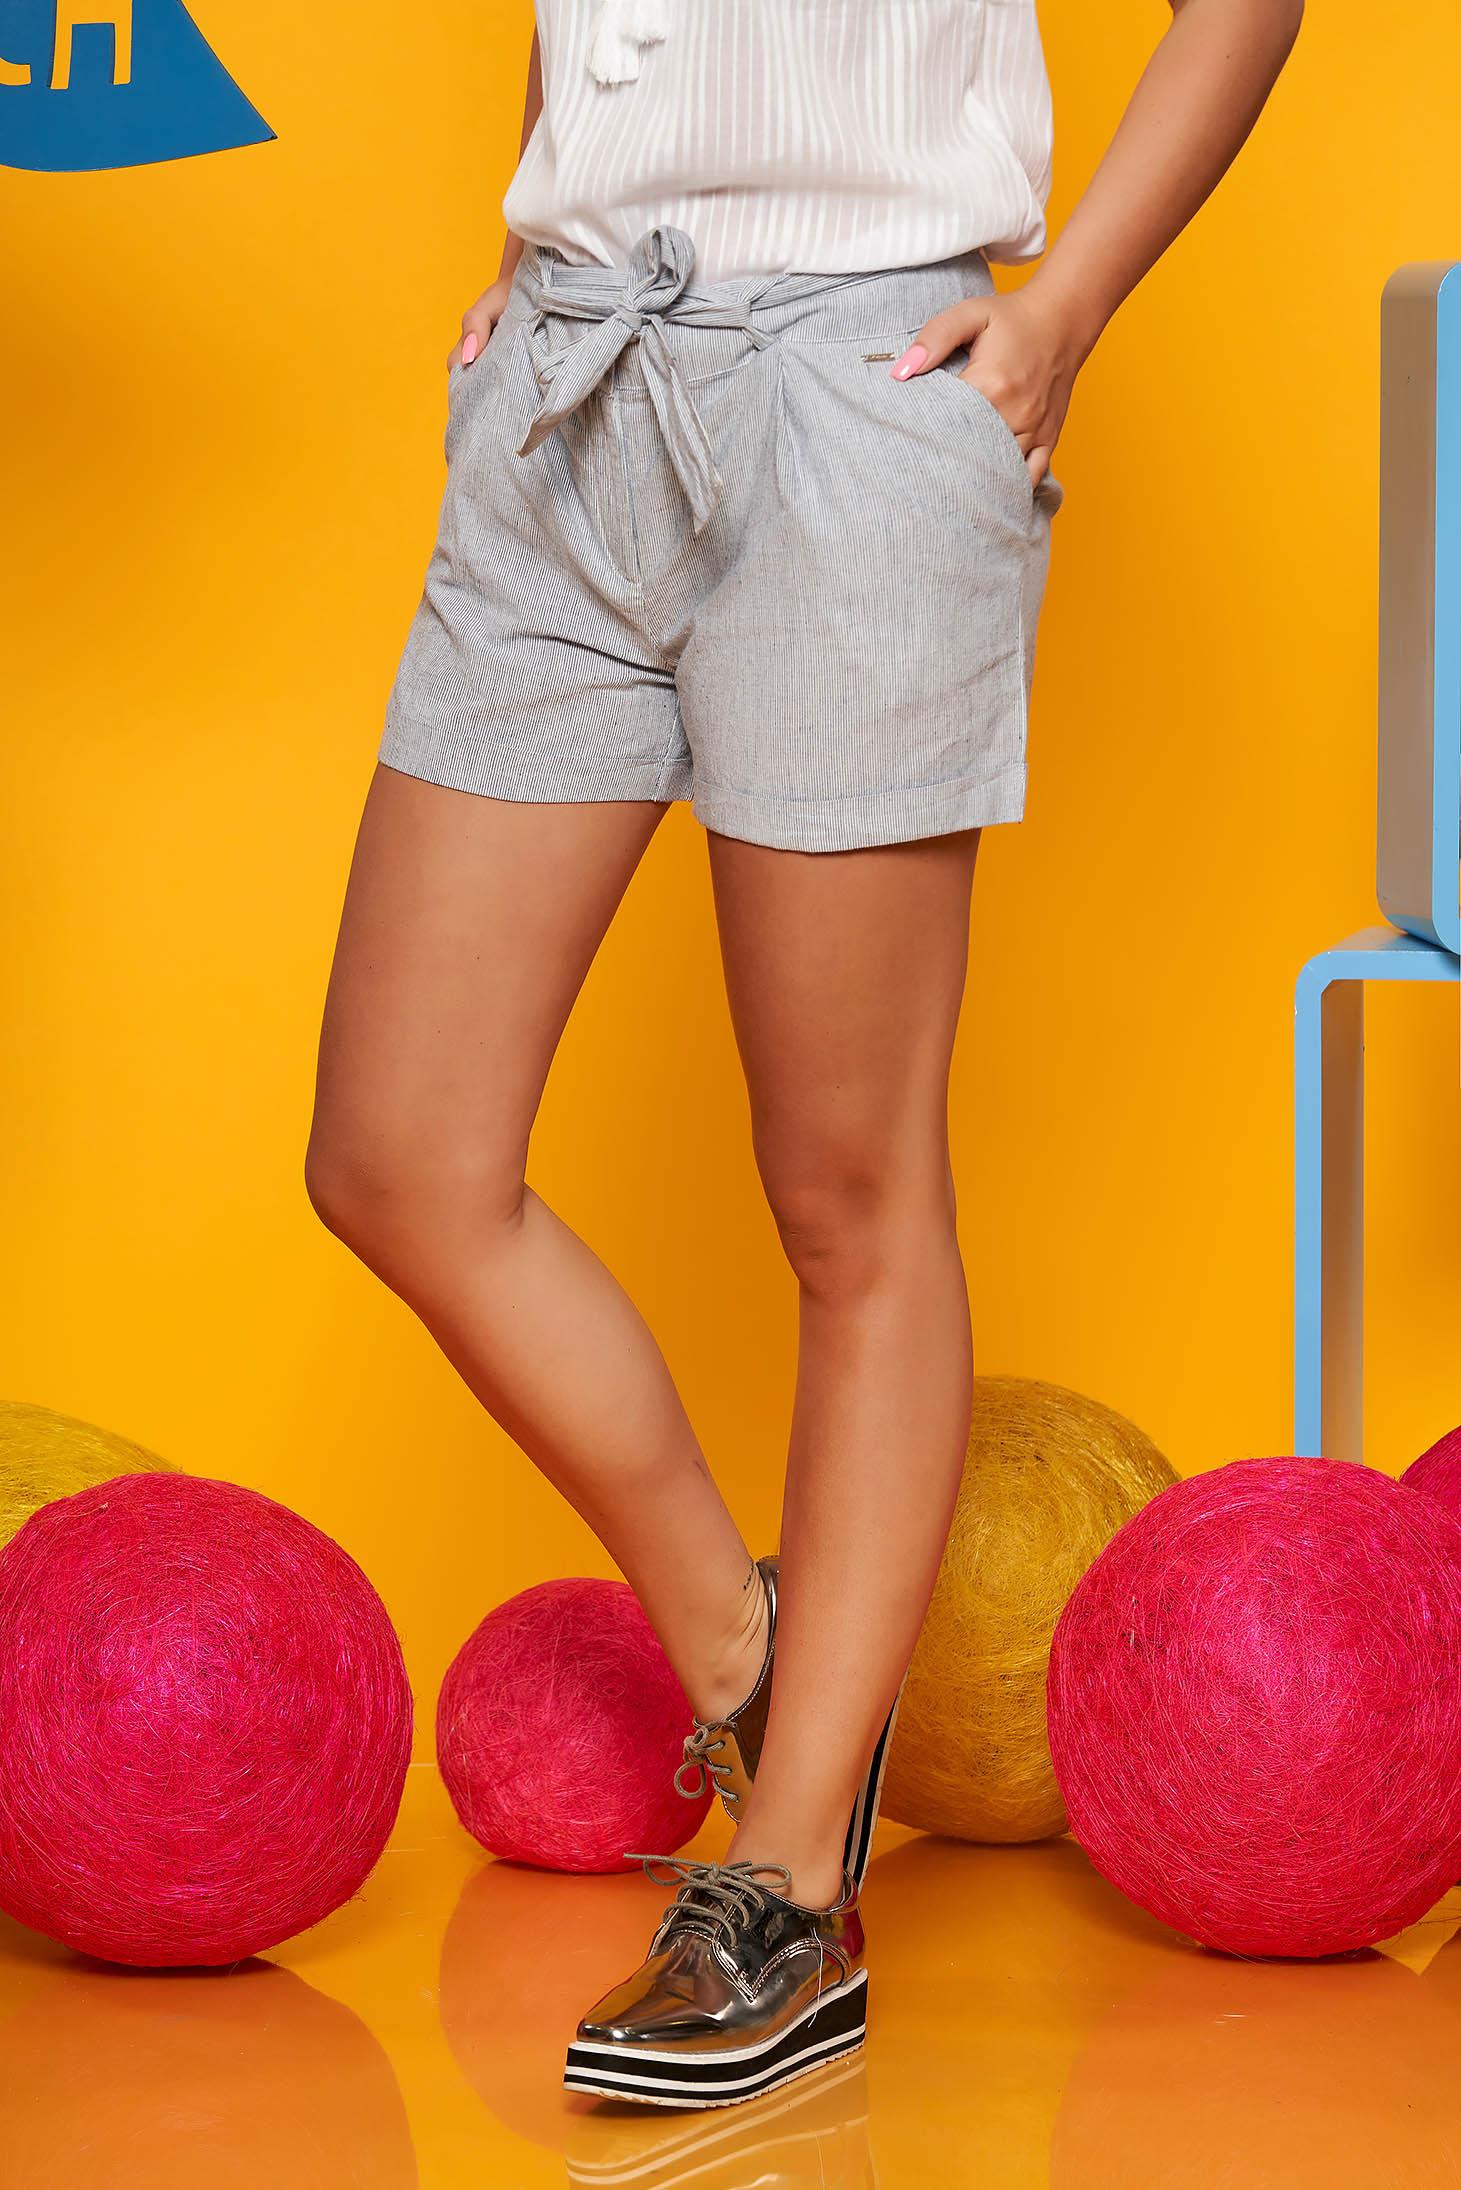 Szürke casual normál derekú rövidnadrág rugalmatlan pamutból